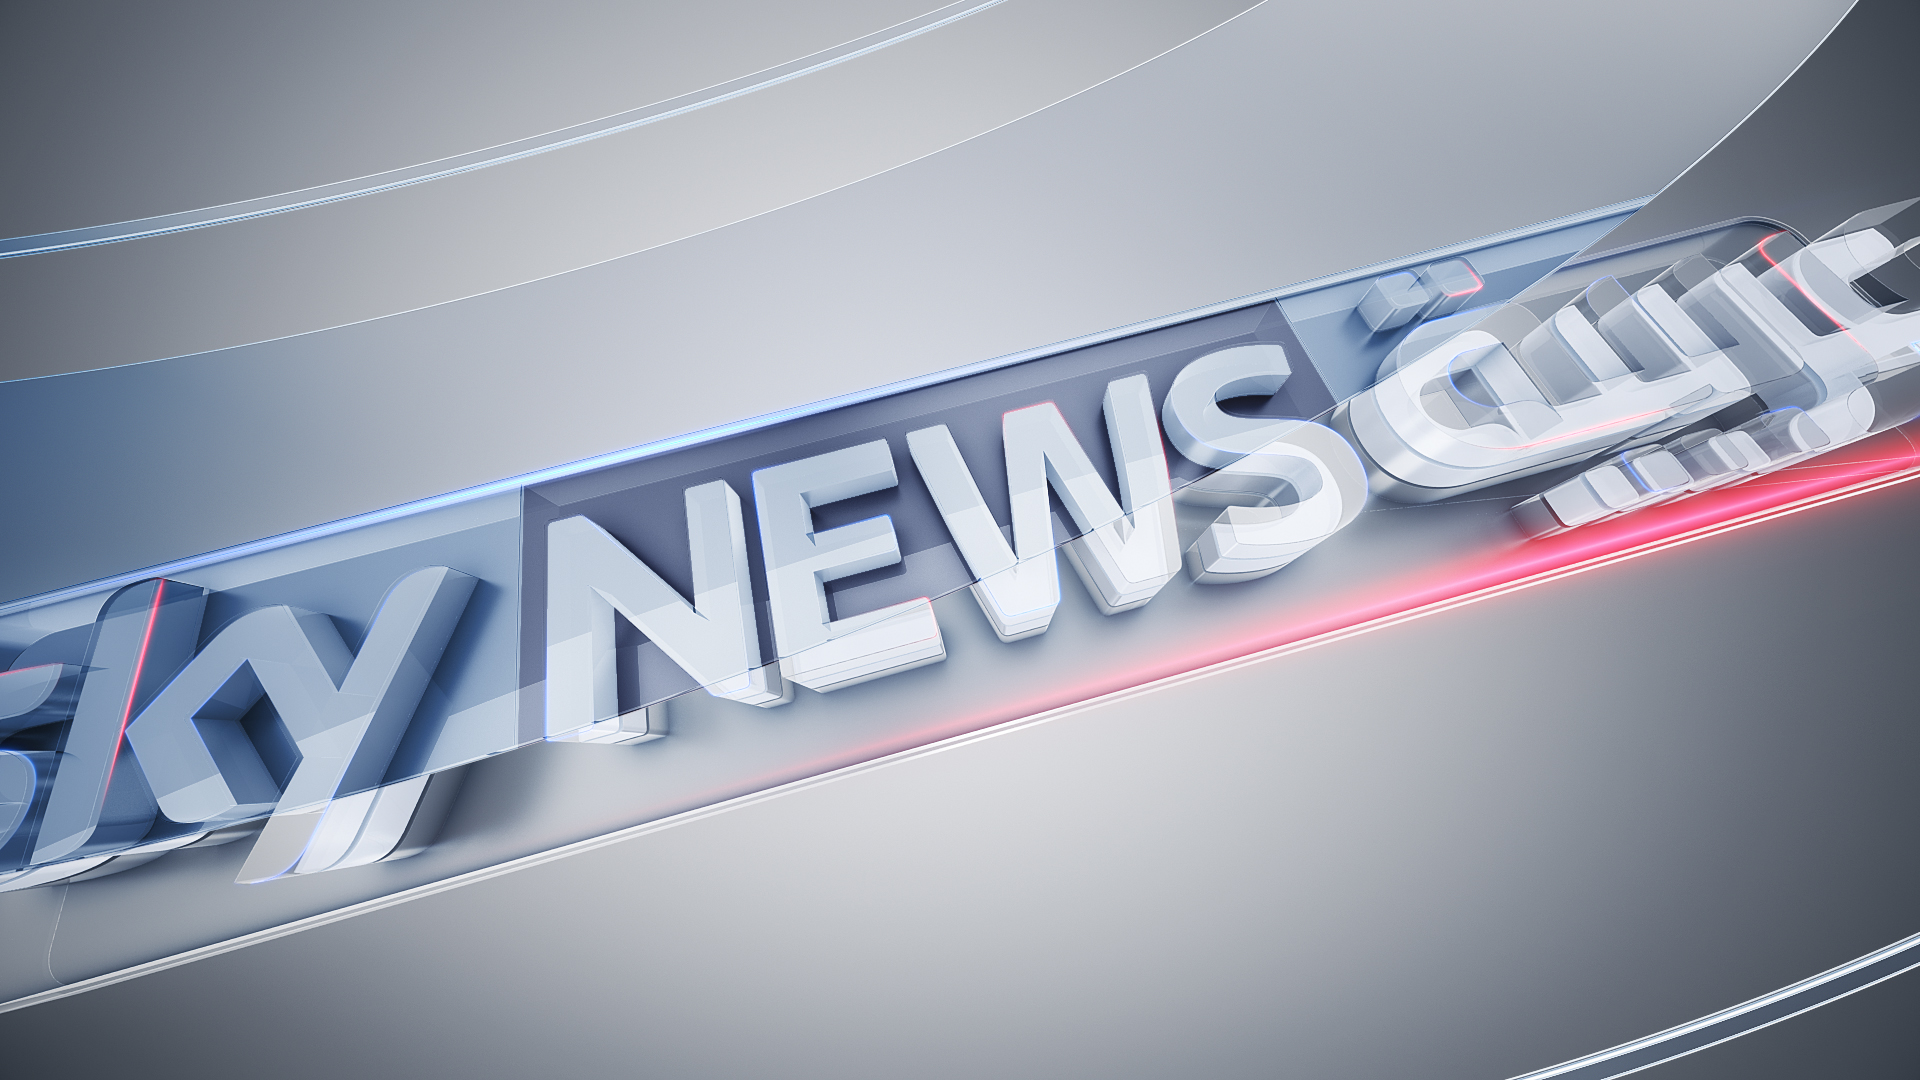 NCS_Sky-News_003